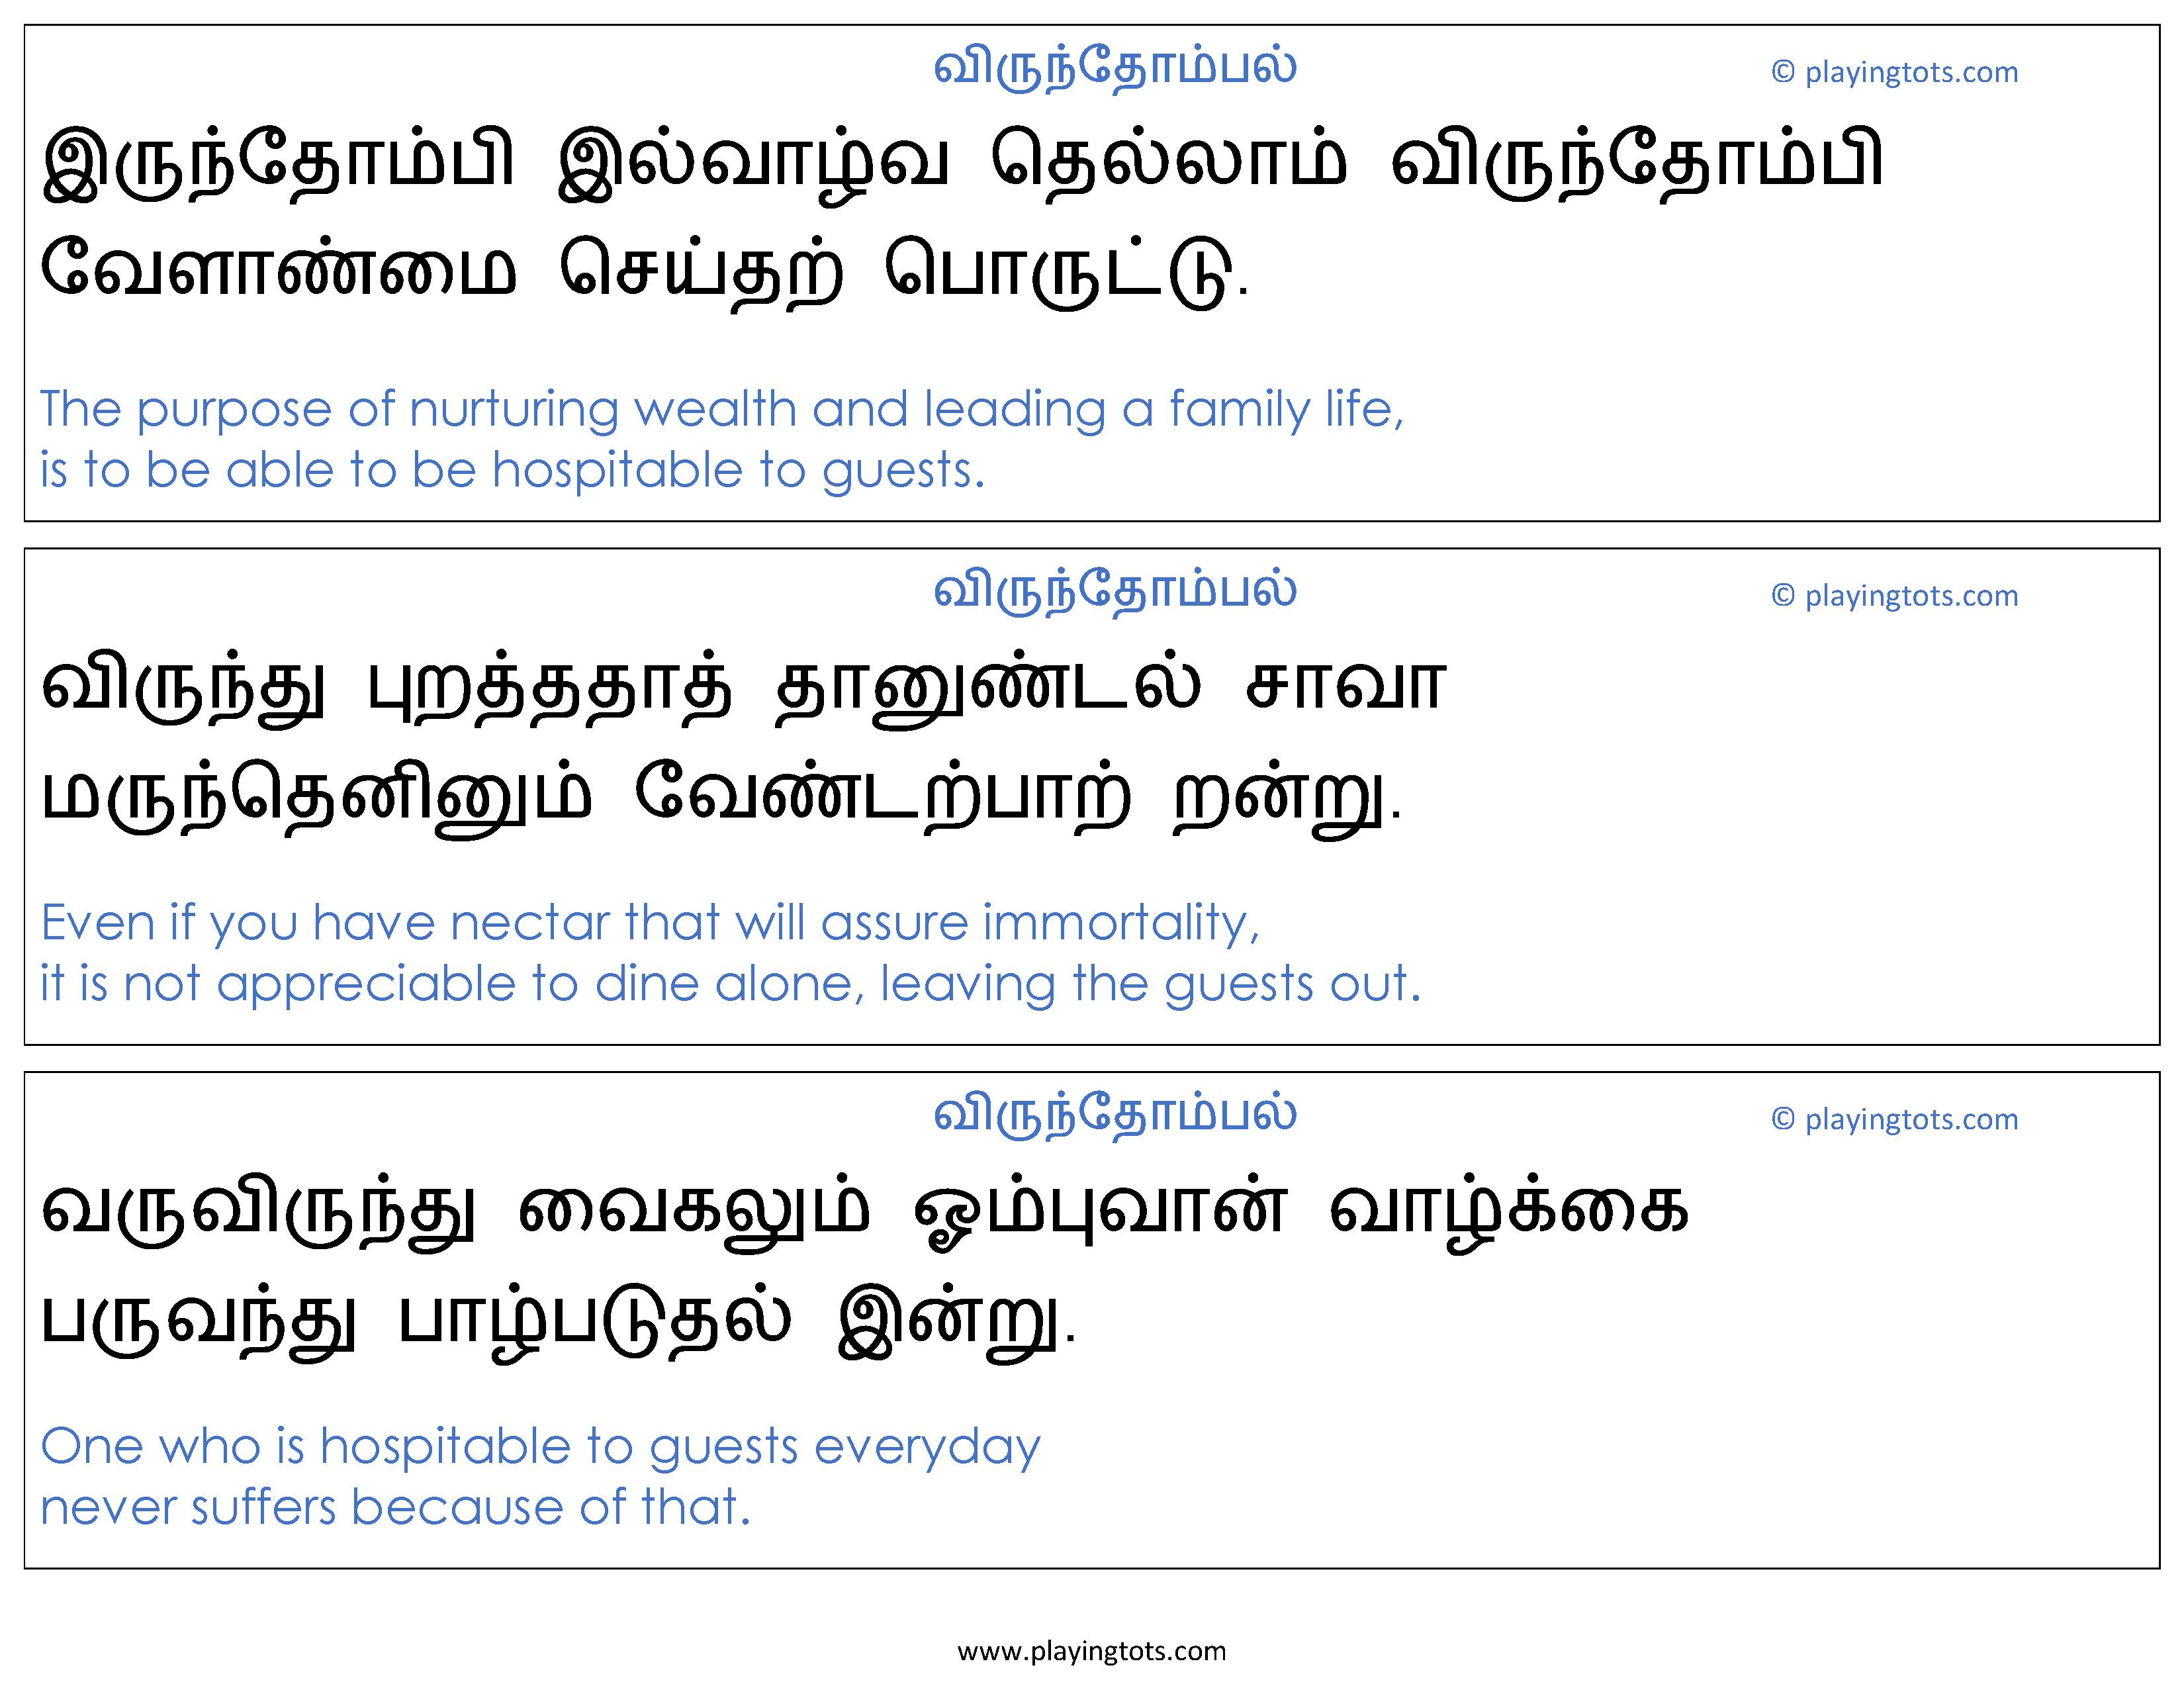 Pin By Playingtots On Free Tamil Thirukkural Flashcards